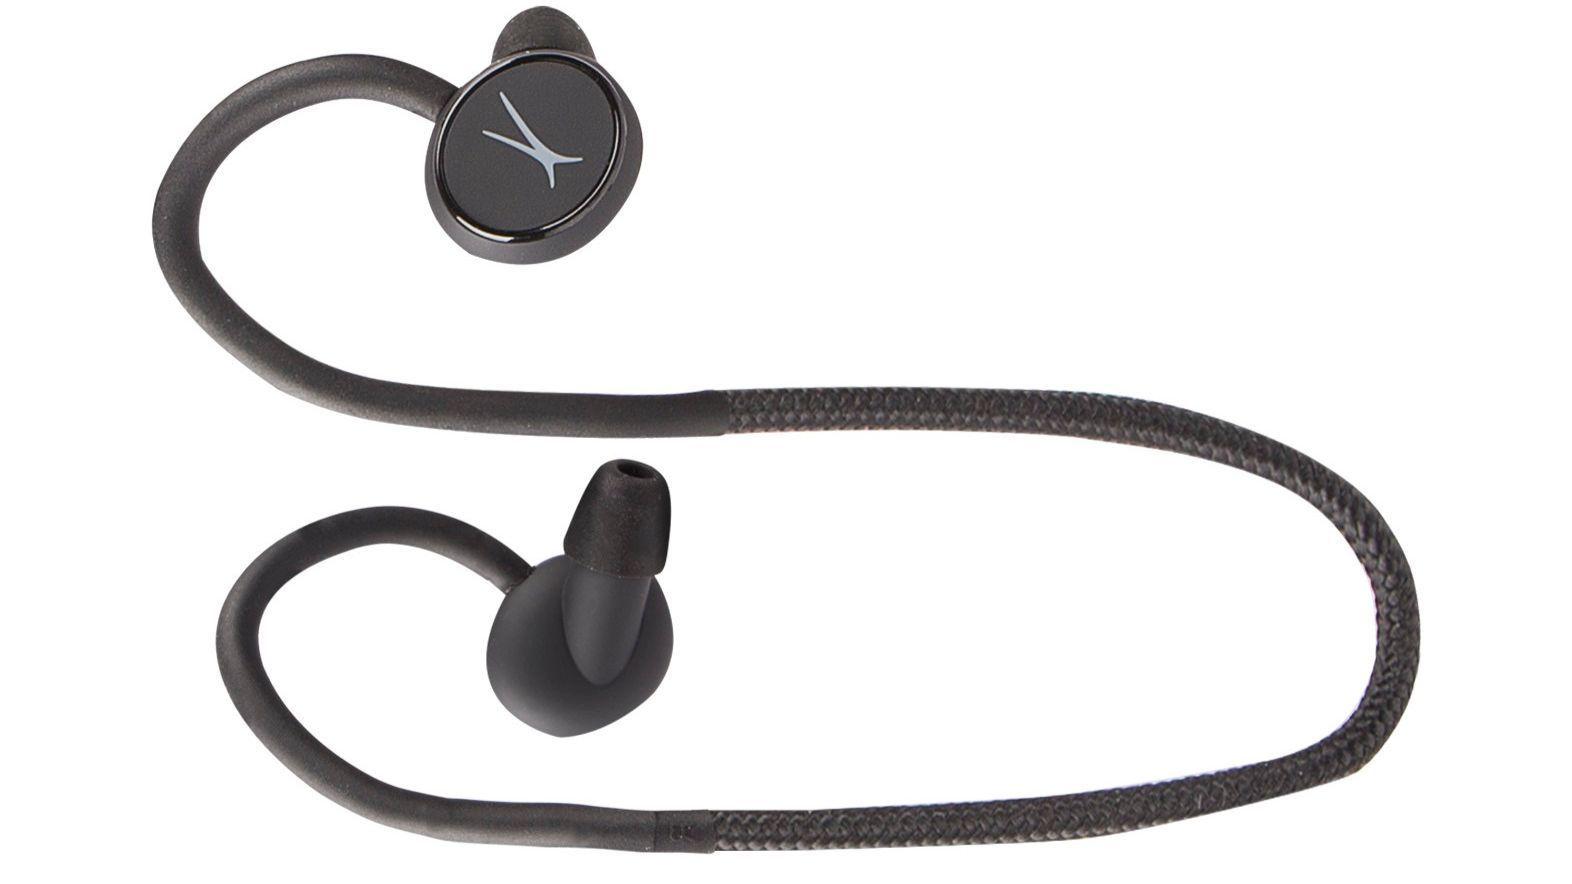 Altec Lansing x Nick Jonas NJEP-1 in-ear Bluetooth earphones